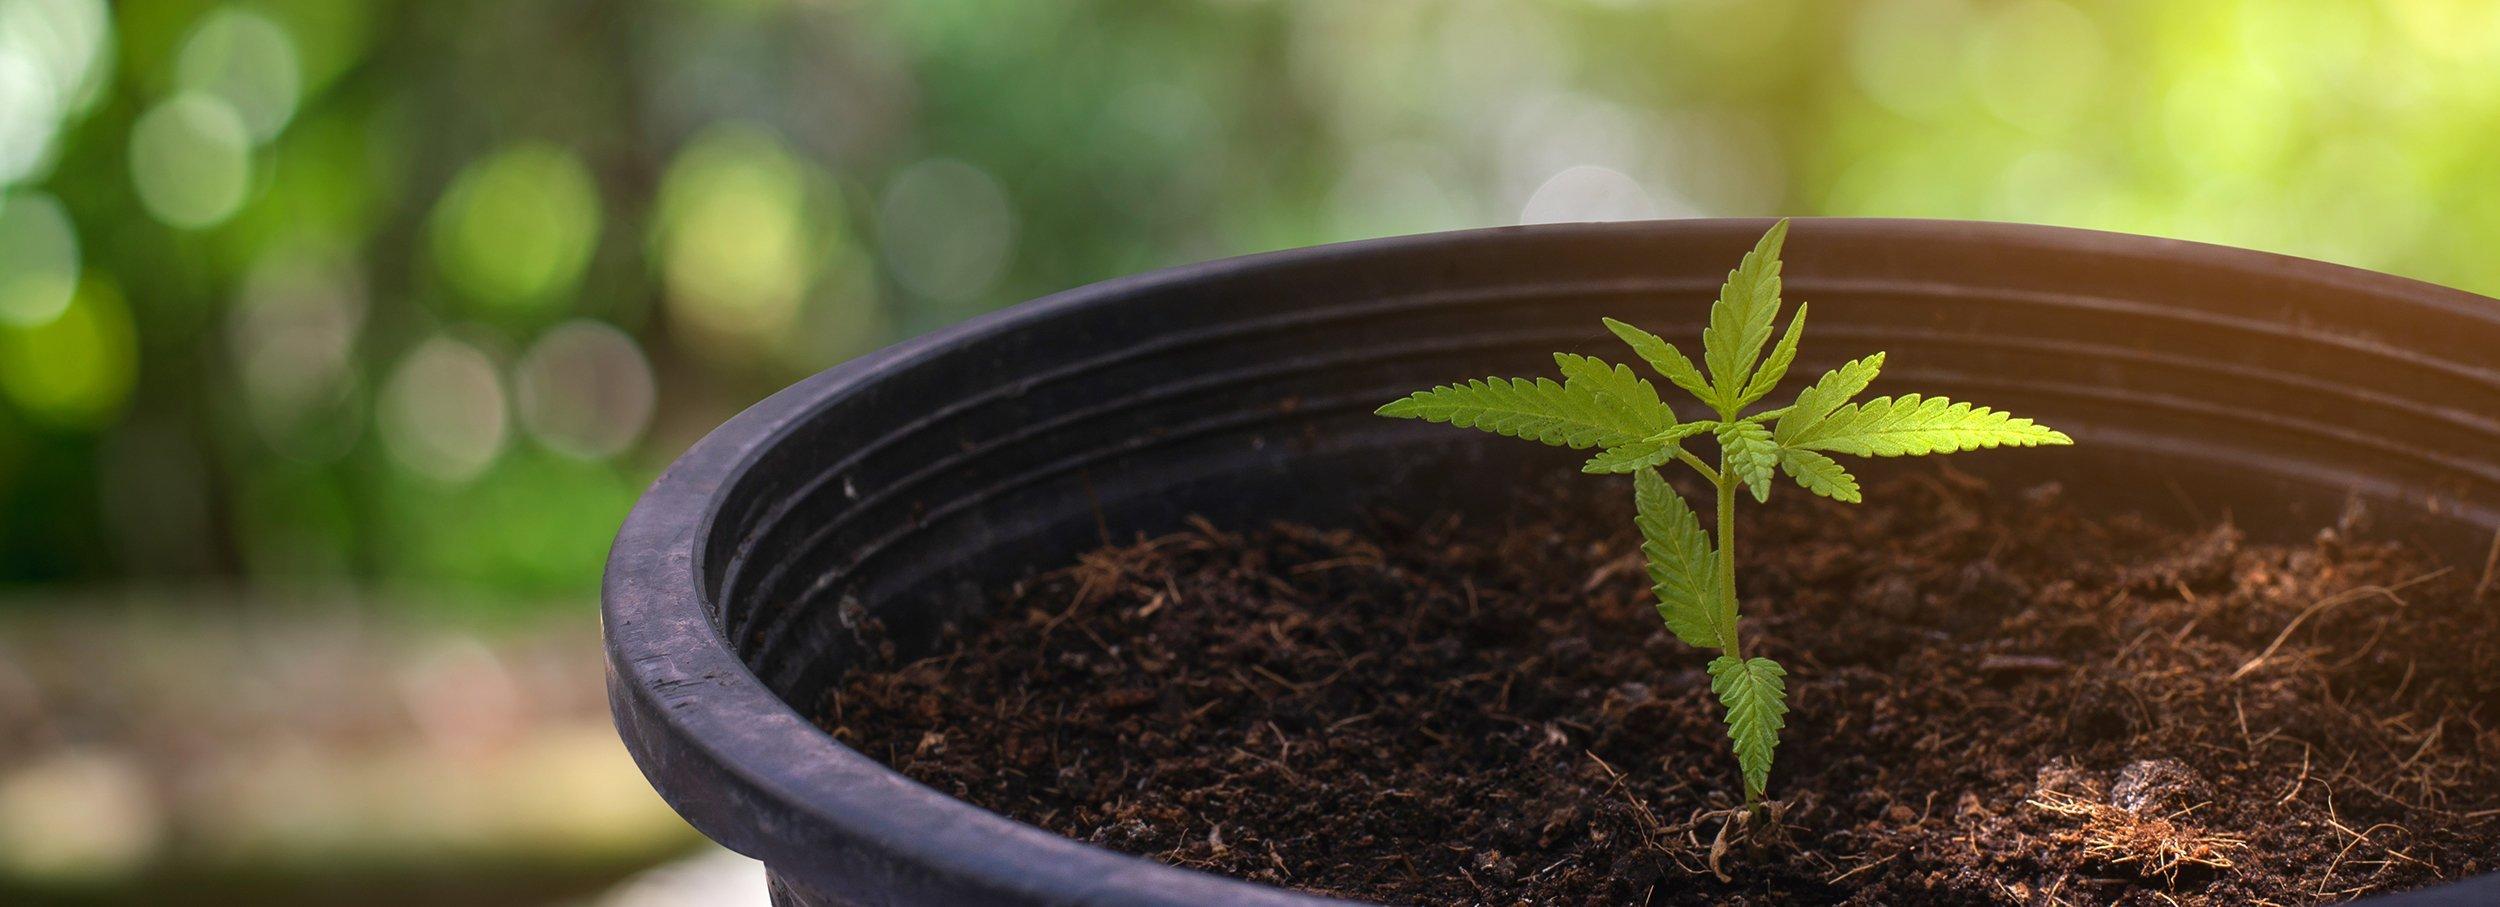 marijuana seedling in pot